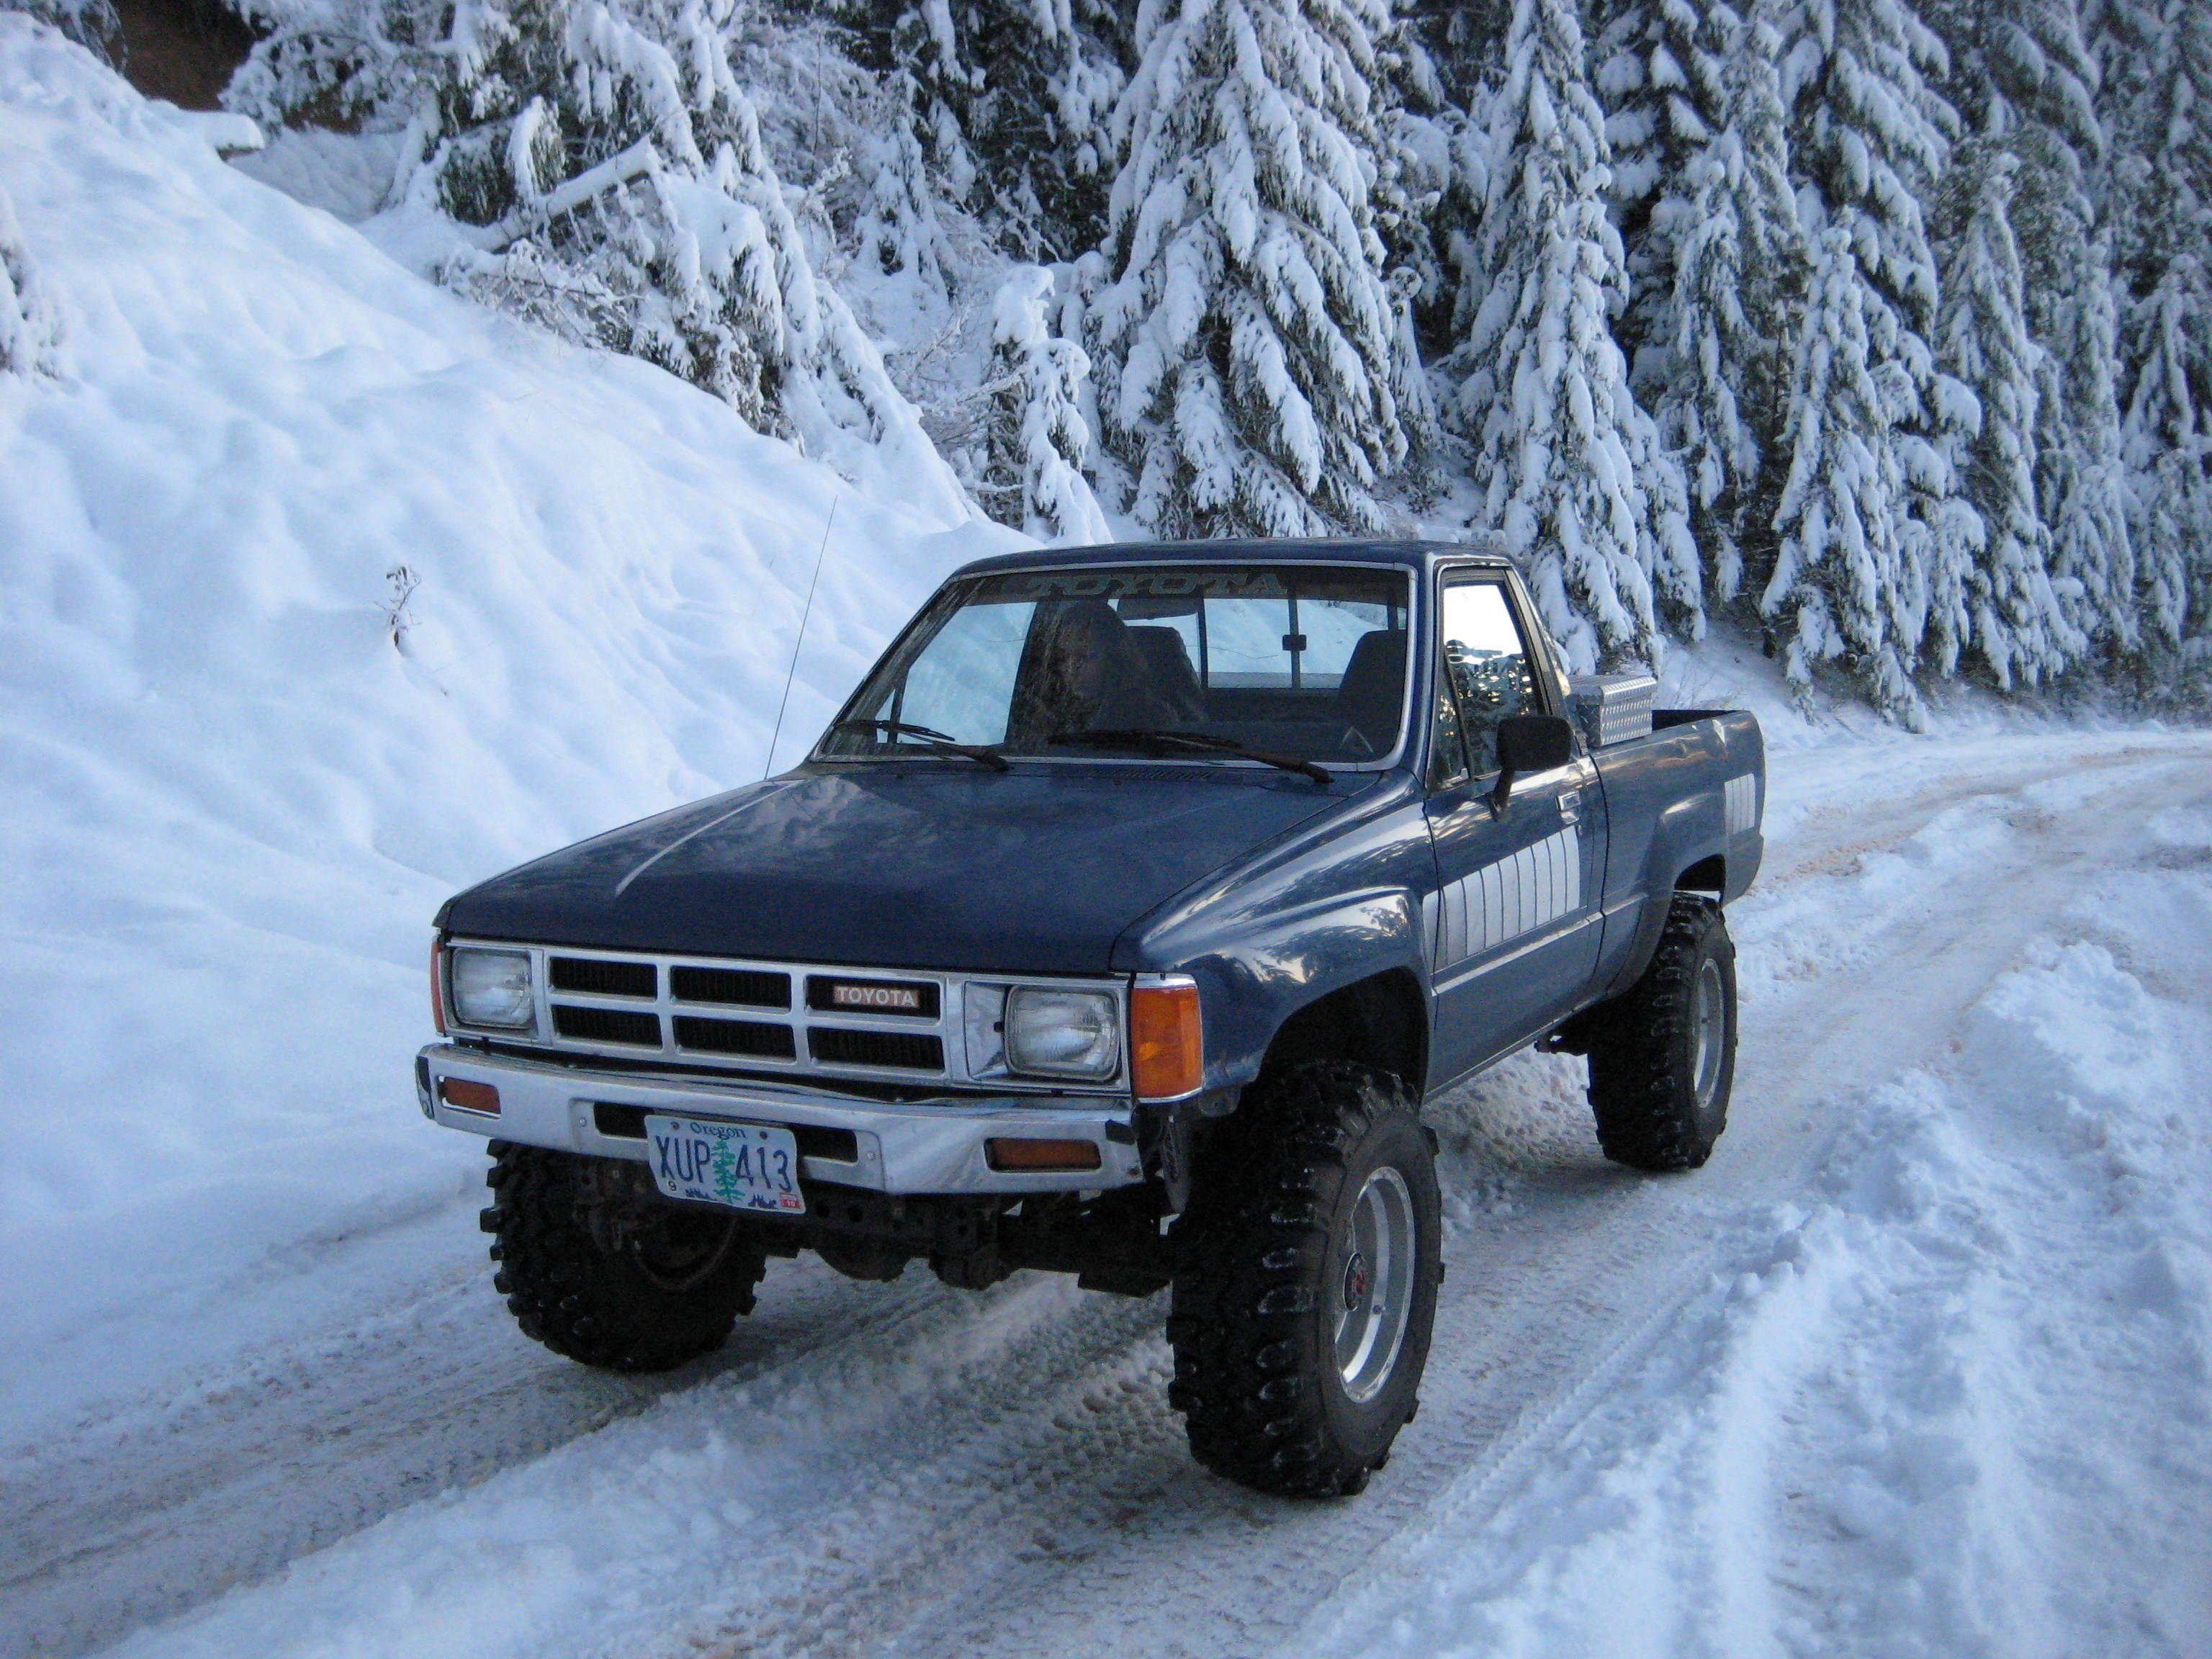 my 85 toyota pickup straight axle w 22re pro comp lift super